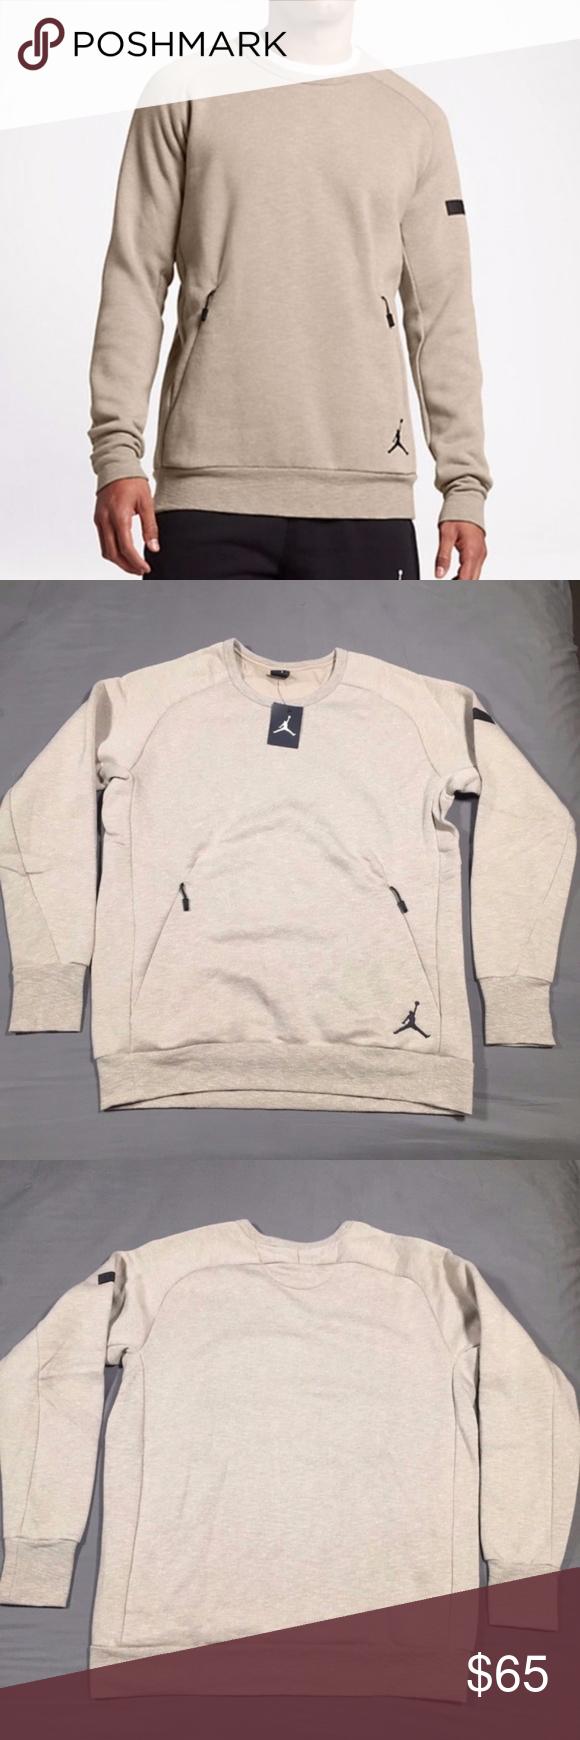 dc5f42dceeb448 Air Jordan Icon Fleece Crew Sweatshirt Size XLT NWT Nike Air Jordan Men s Icon  Fleece Crew Sweatshirt 802181 235 NWT Fabric Content  60% Cotton 40% ...